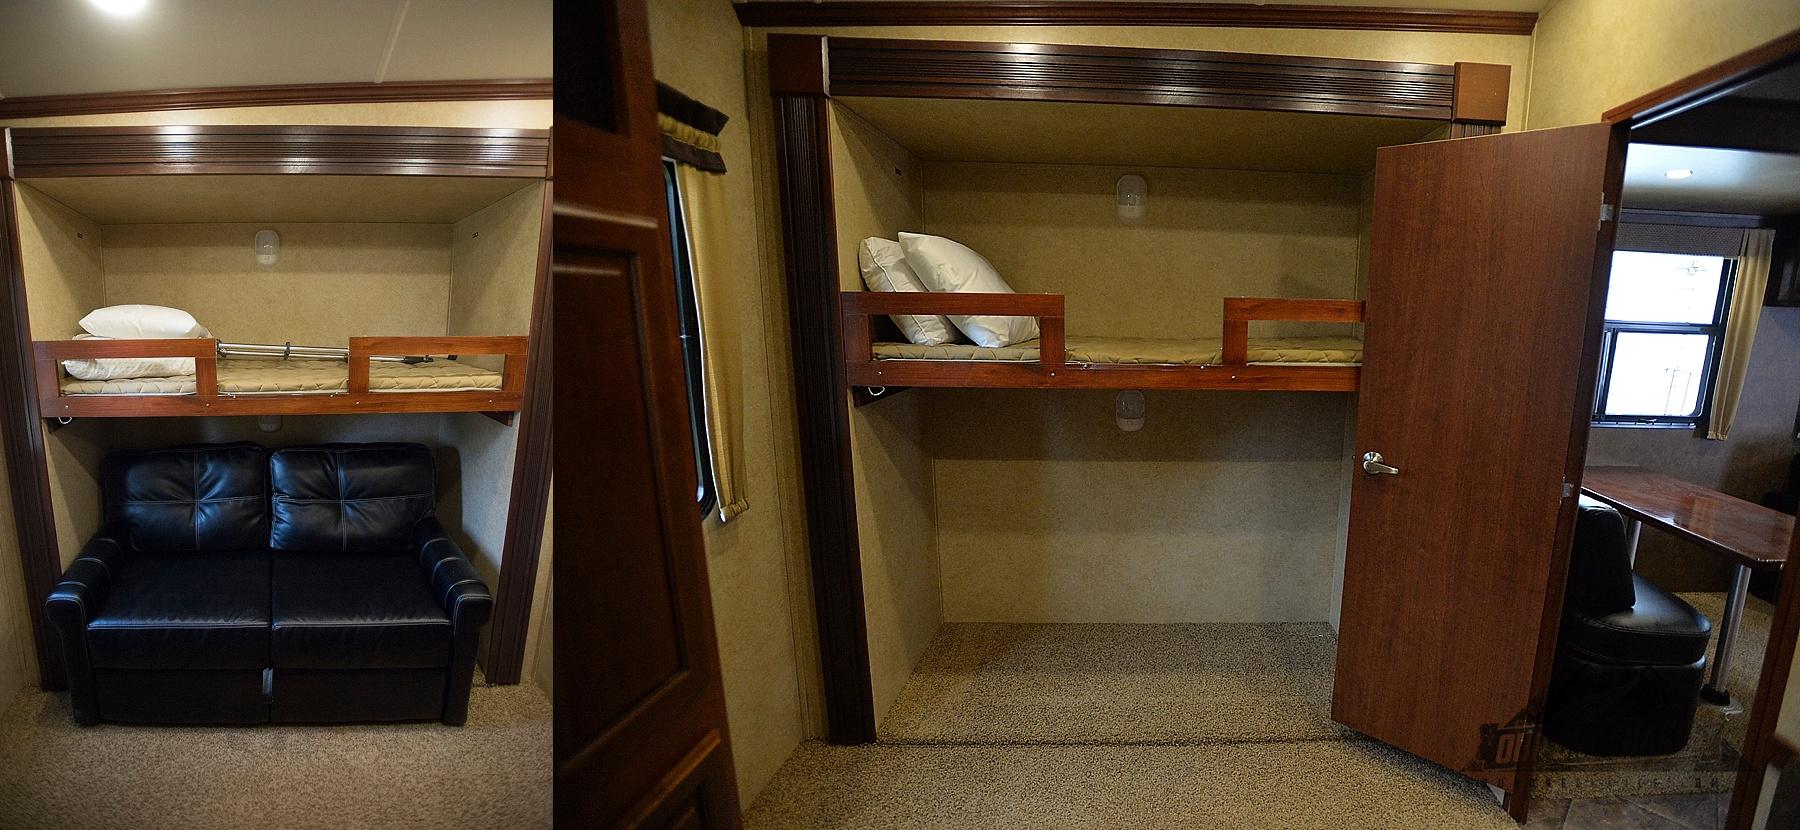 Bay Hill Fifth Wheel RV Living Room Remodel_0005